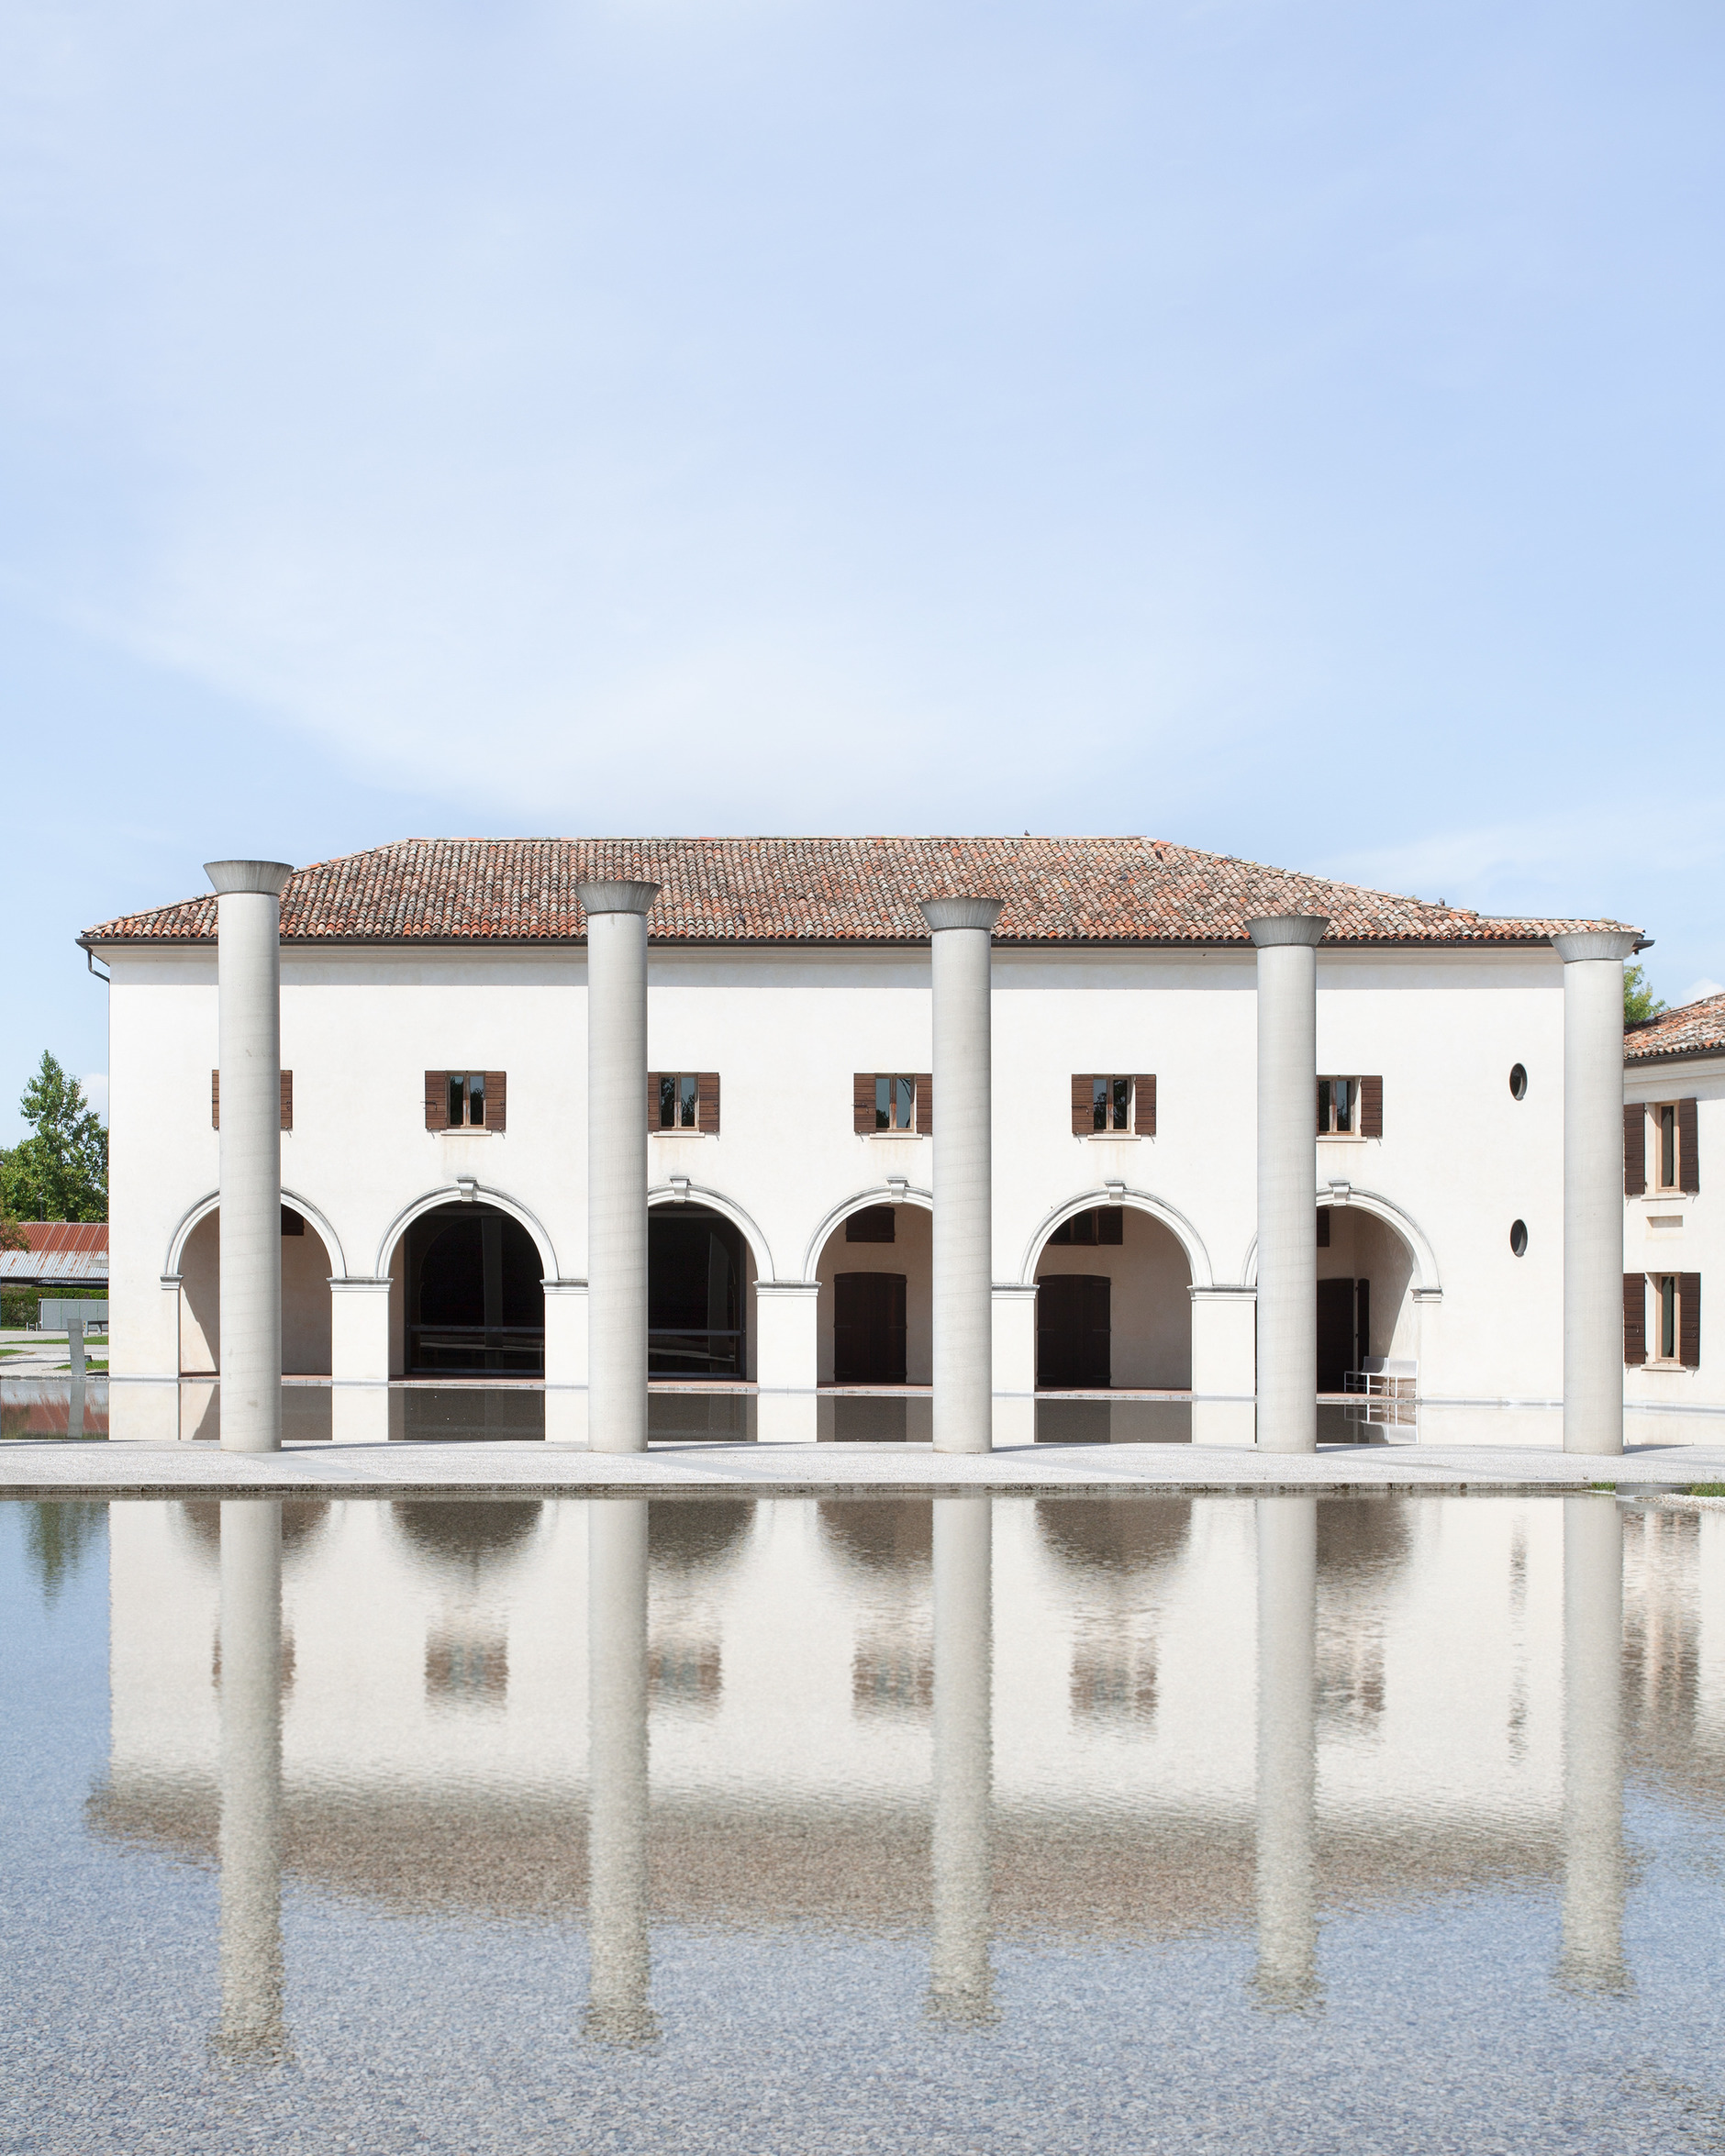 Архитектор Тадао Андо: певец бетона (галерея 15, фото 0)